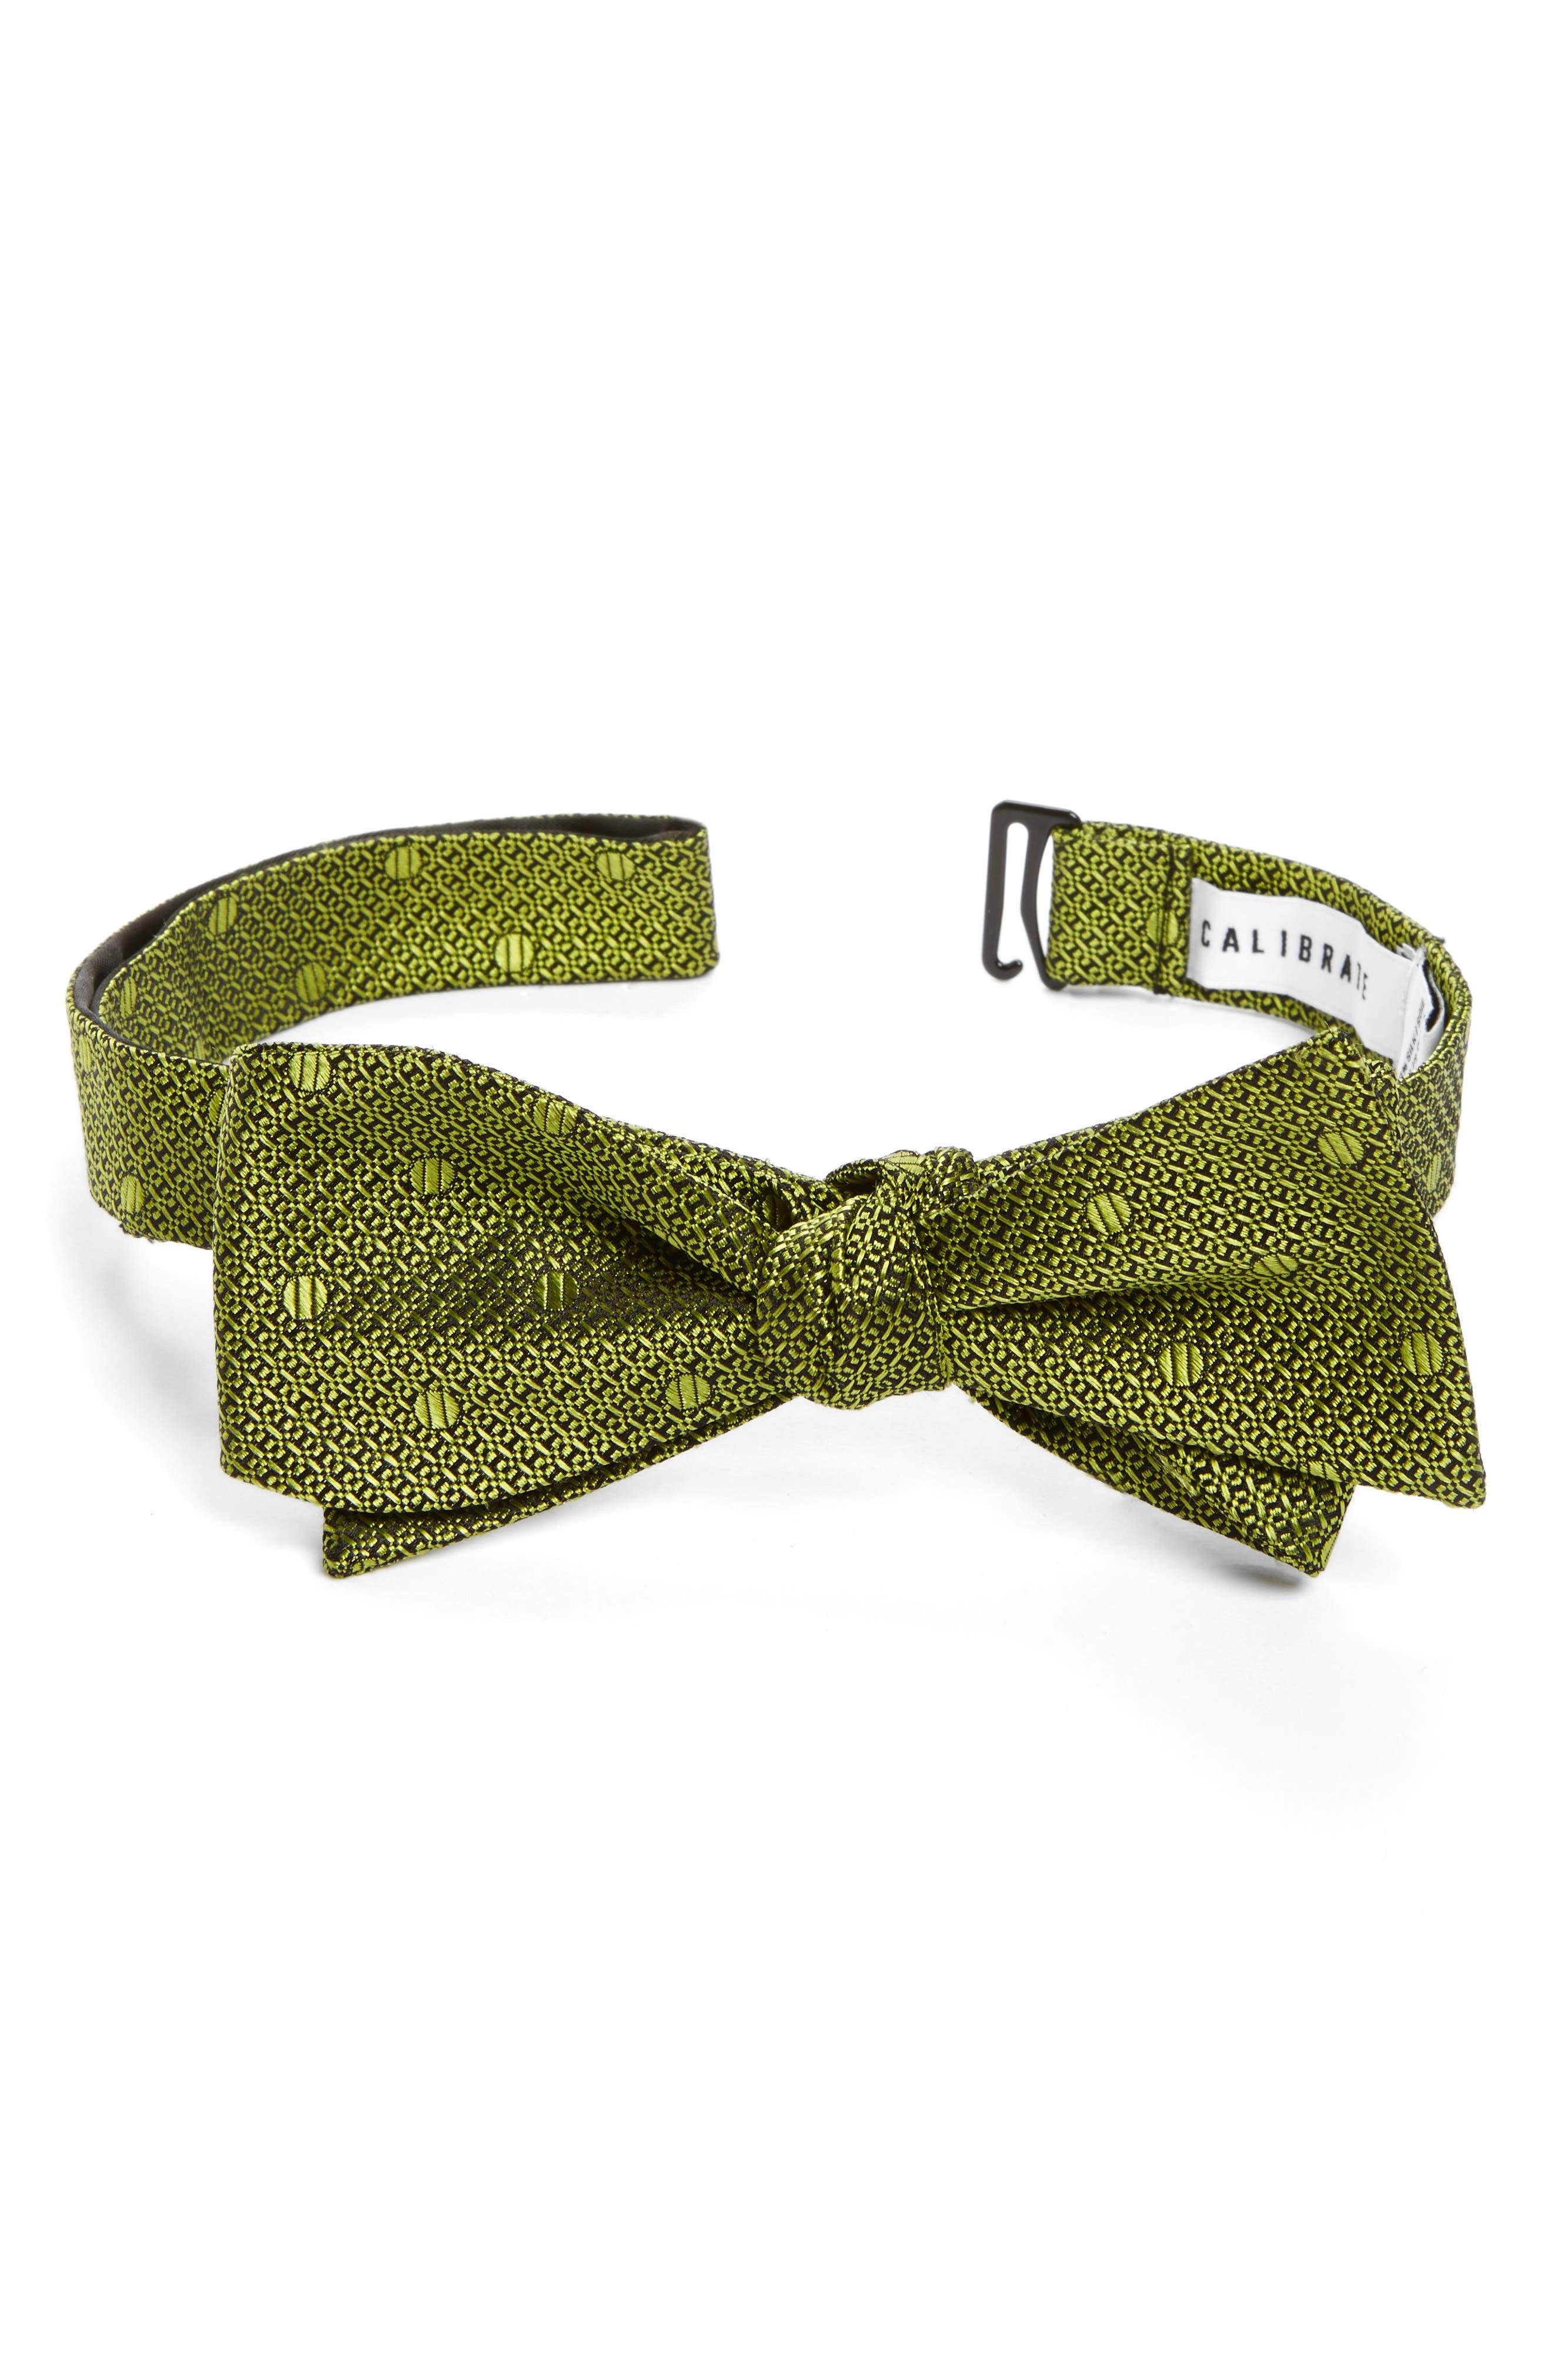 Main Image - Calibrate Textured Dot Silk Bow Tie